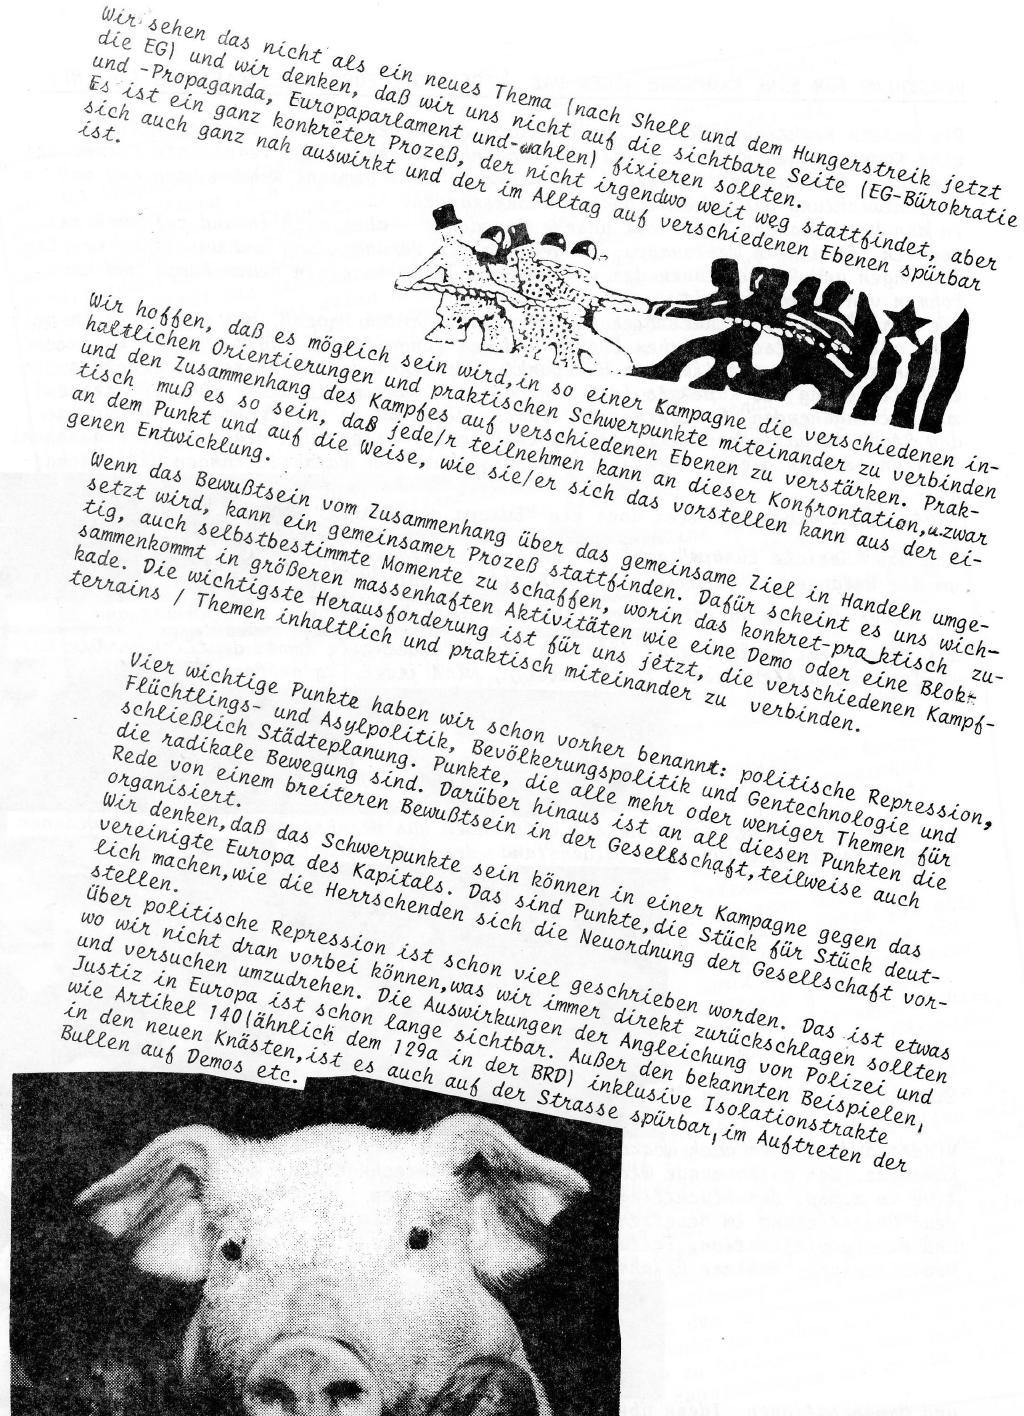 Belgien_Doku_Besetzung_EG_Kommission_1989_098